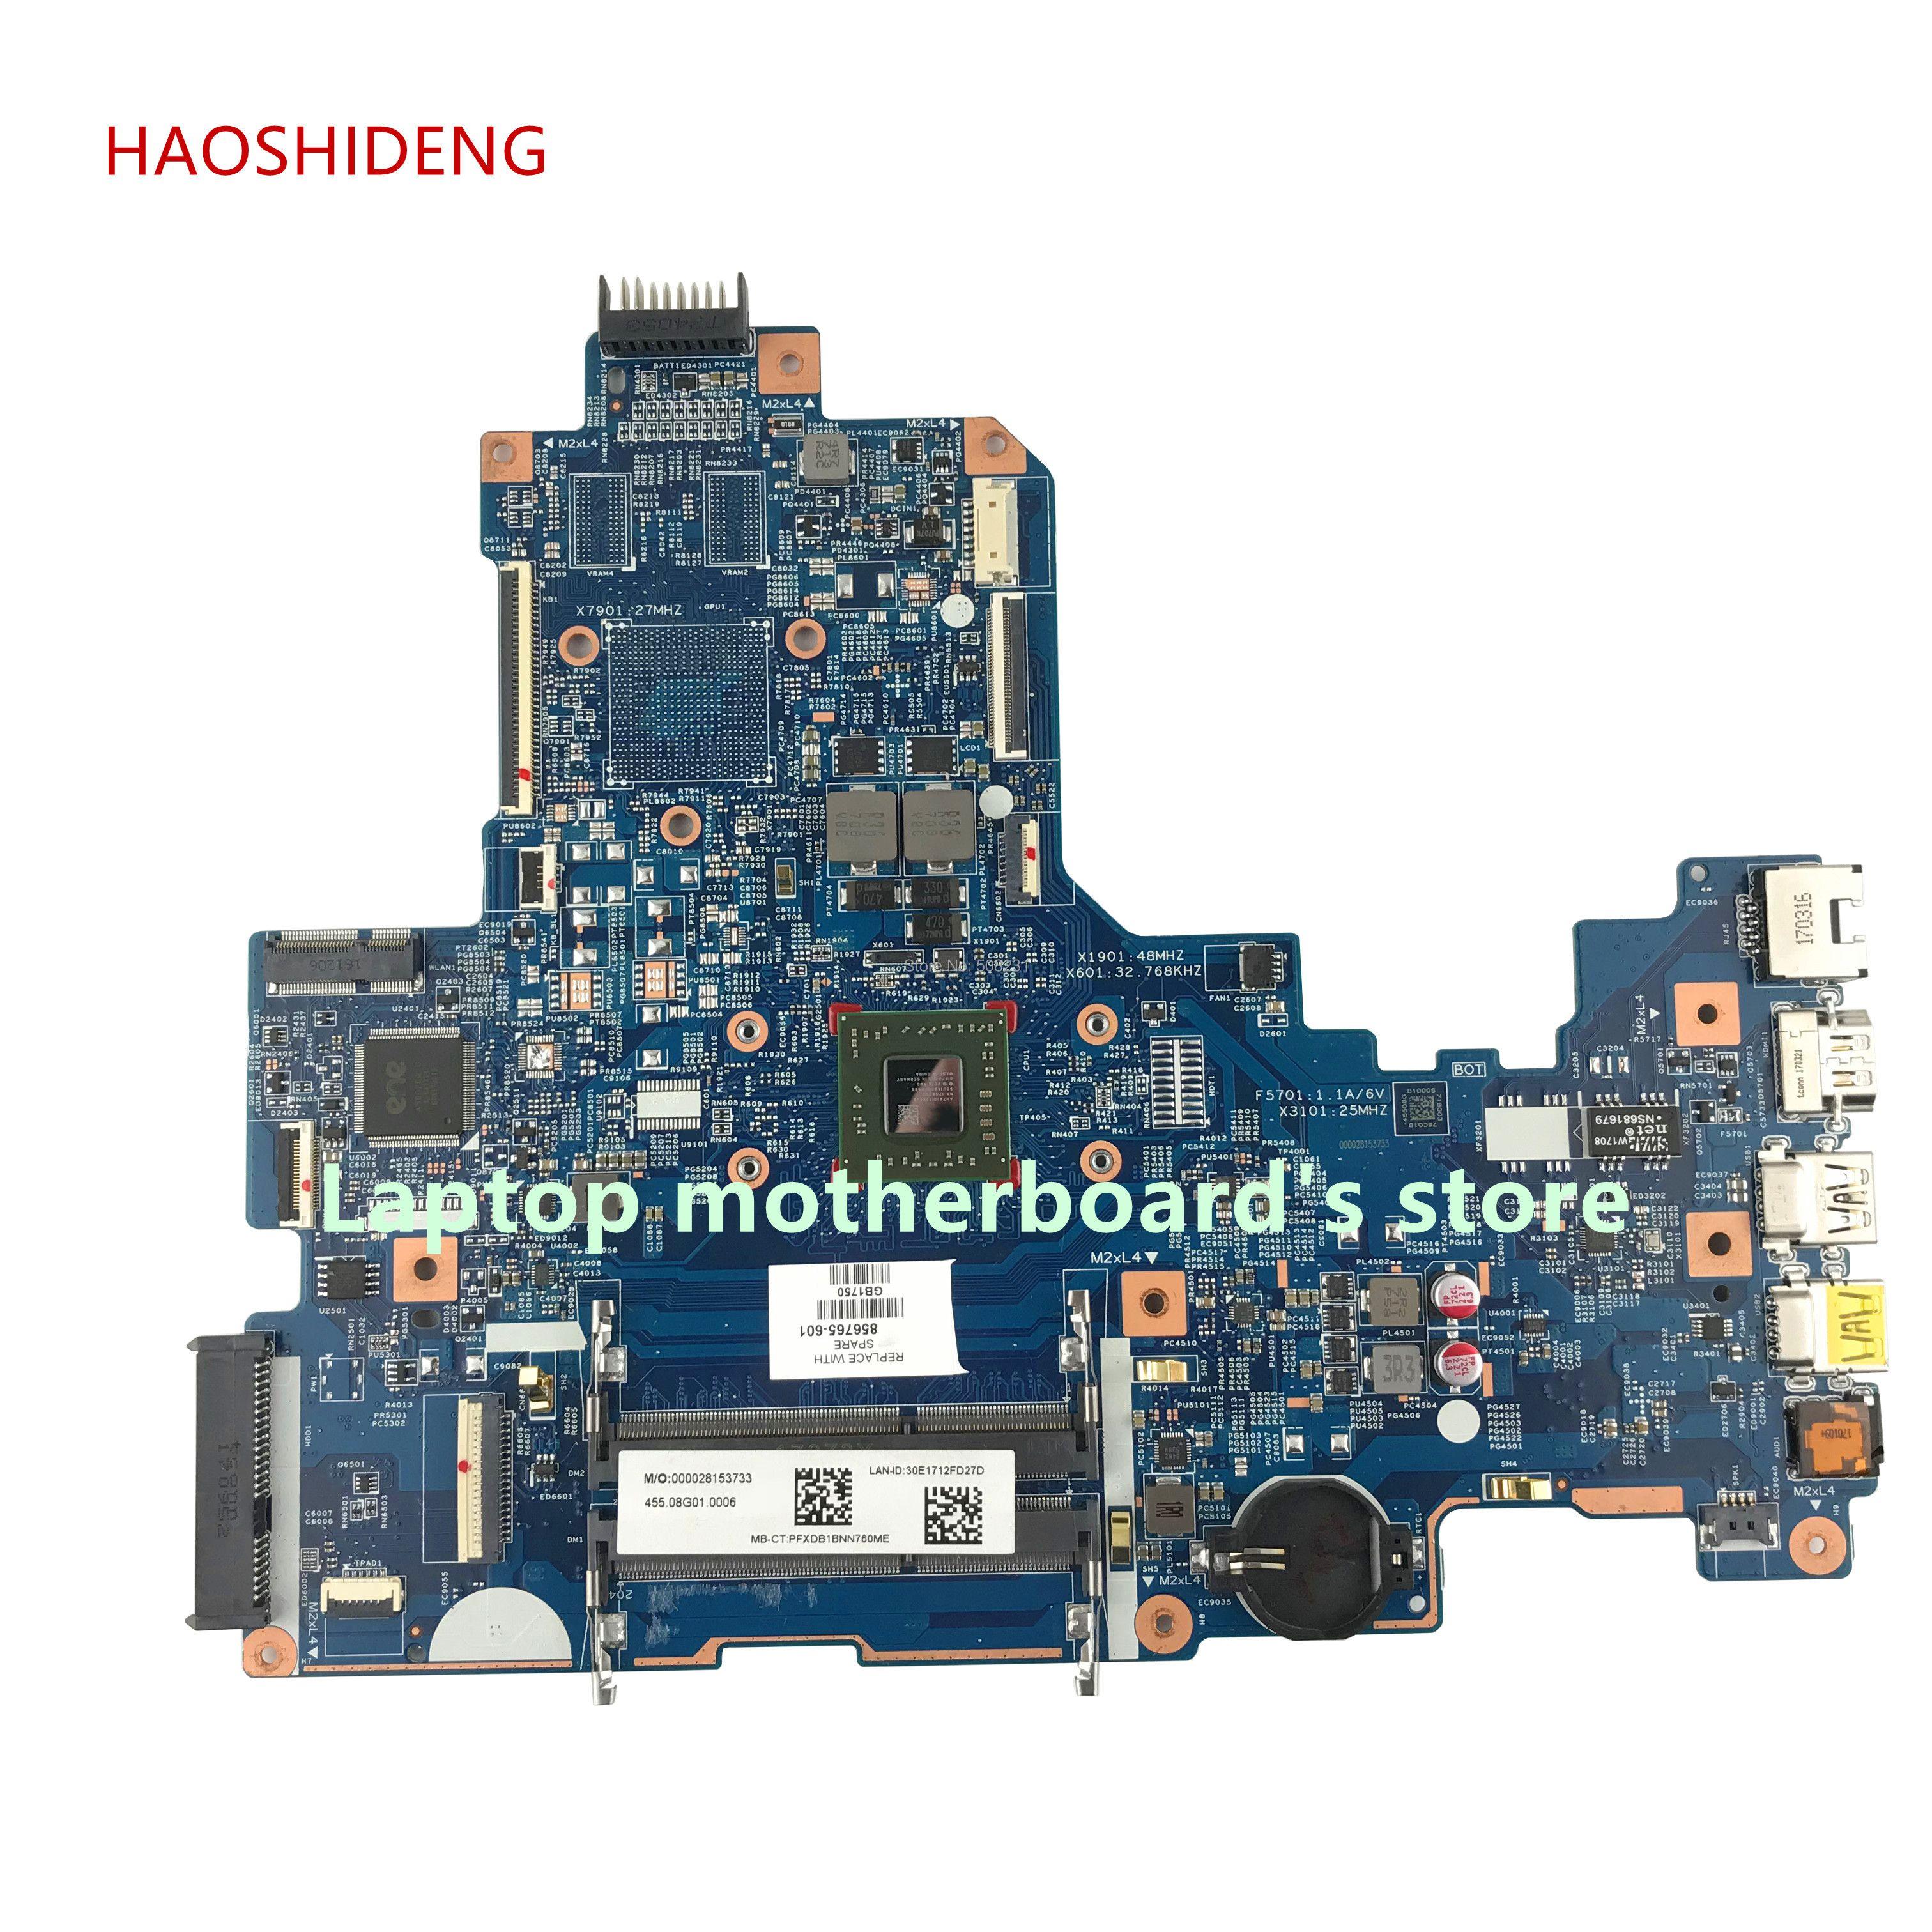 HAOSHIDENG 856765-601 856765-001 448.08G03.0011 mainboard For HP NOTEBOOK 17-Y 17Z-Y 17-Y088CL laptop motherboard with A8-7410